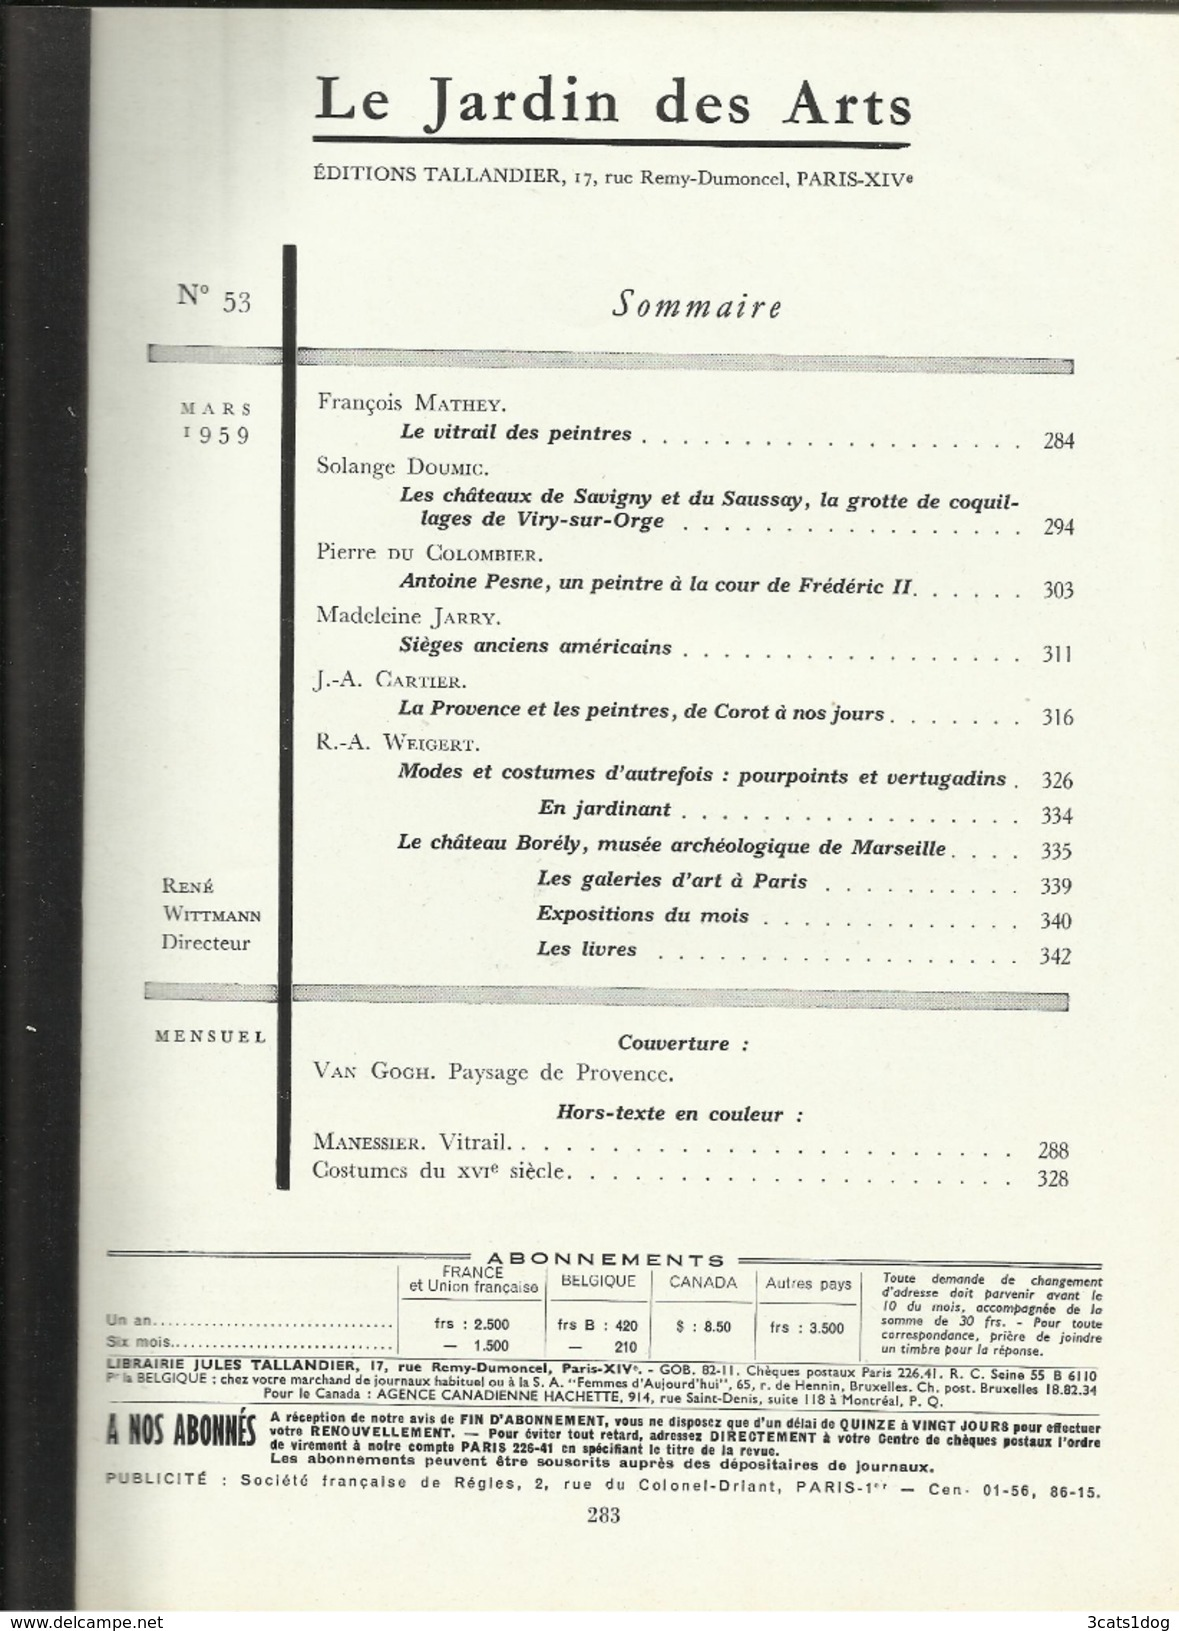 Le Jardin Des Arts - N° 53 - 1959 - Tijdschriften: Abonnementen